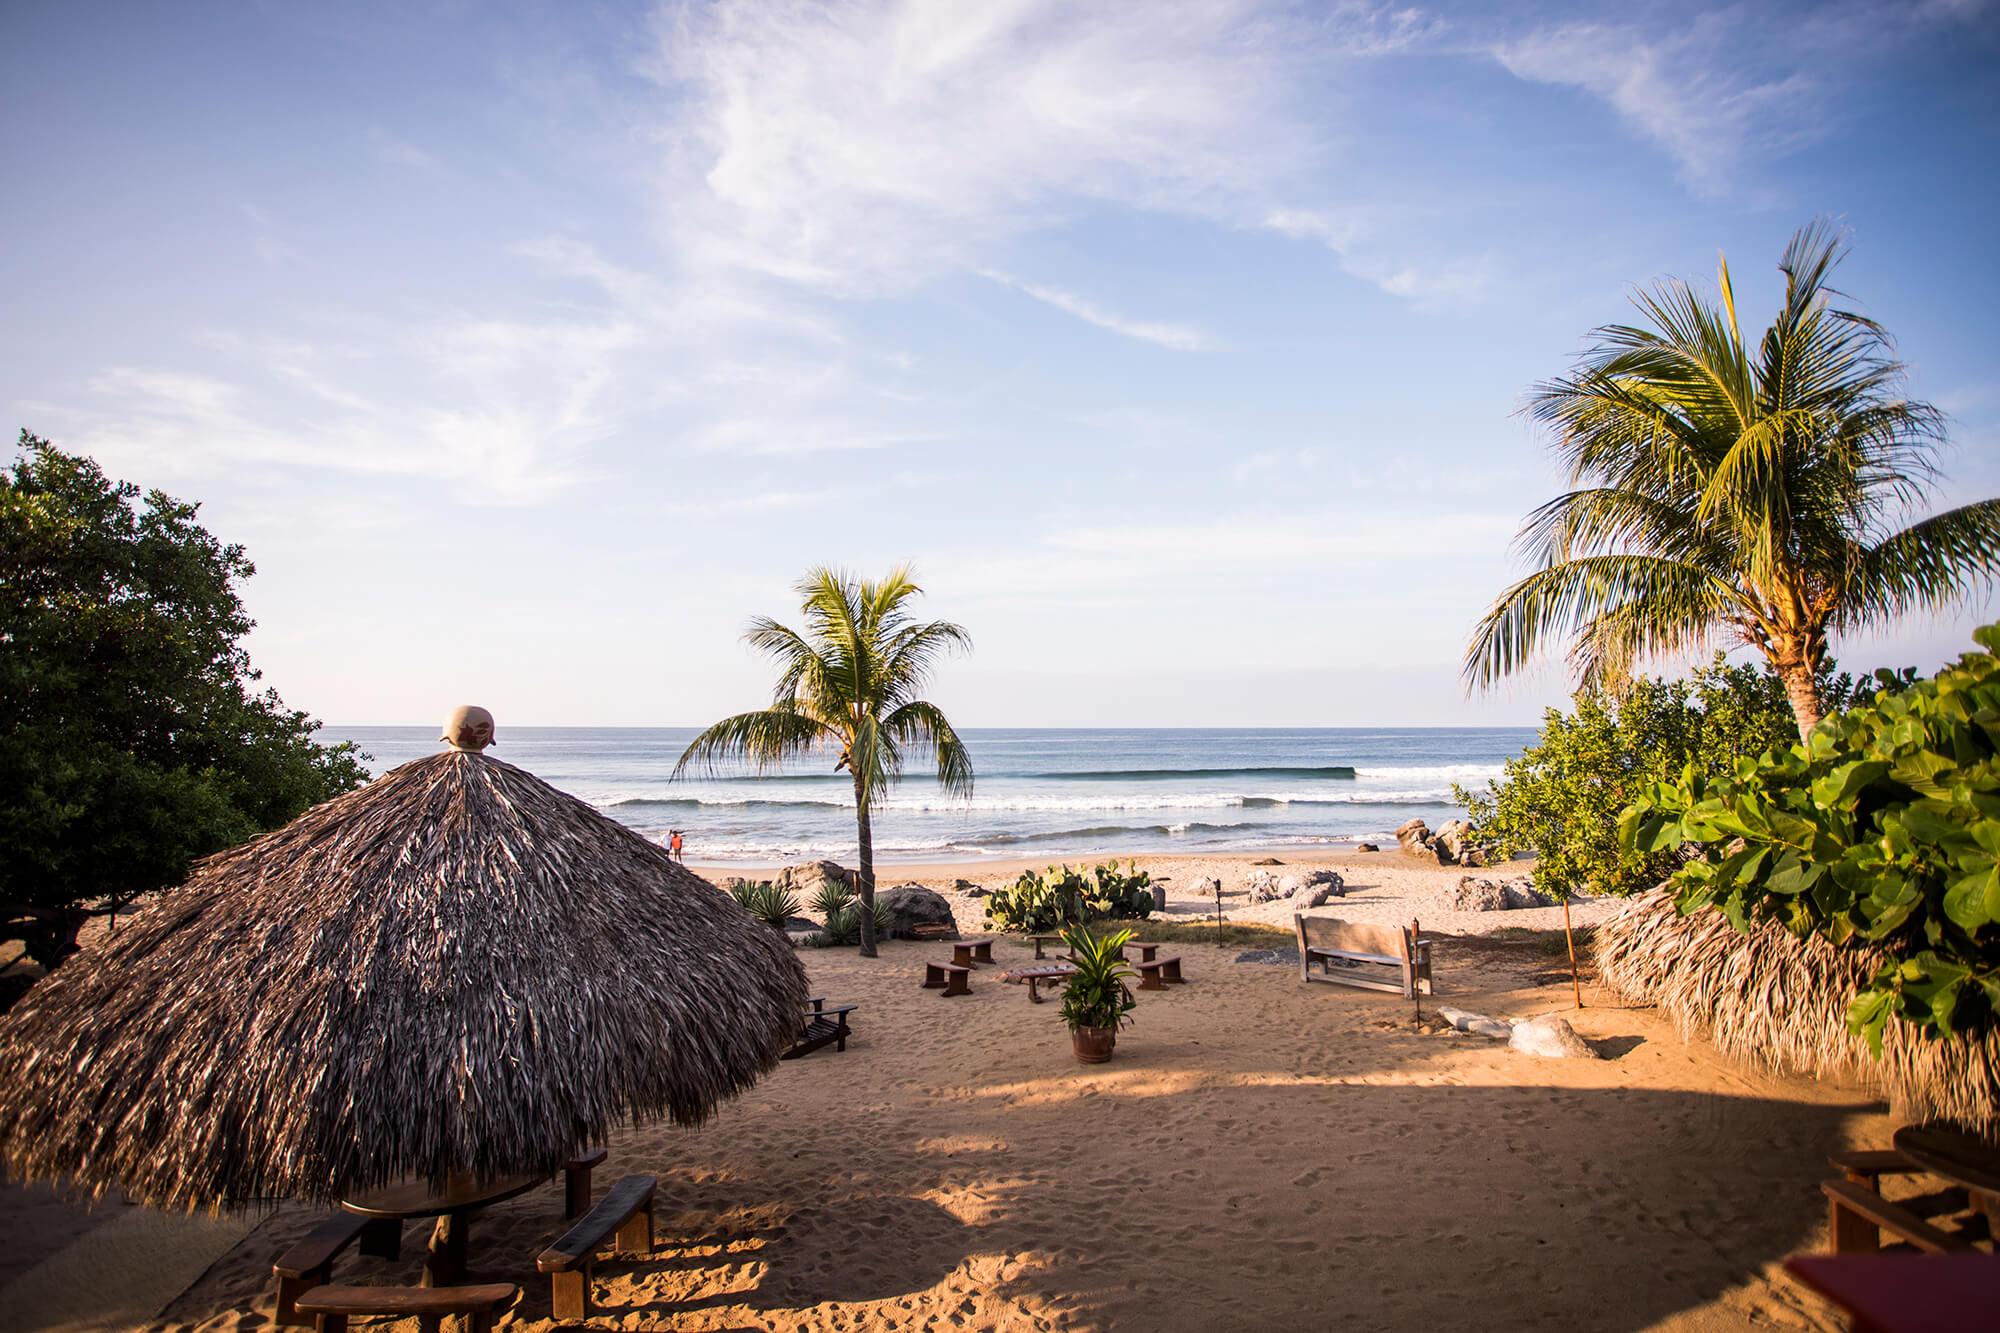 Present Moment Retreat view of beach